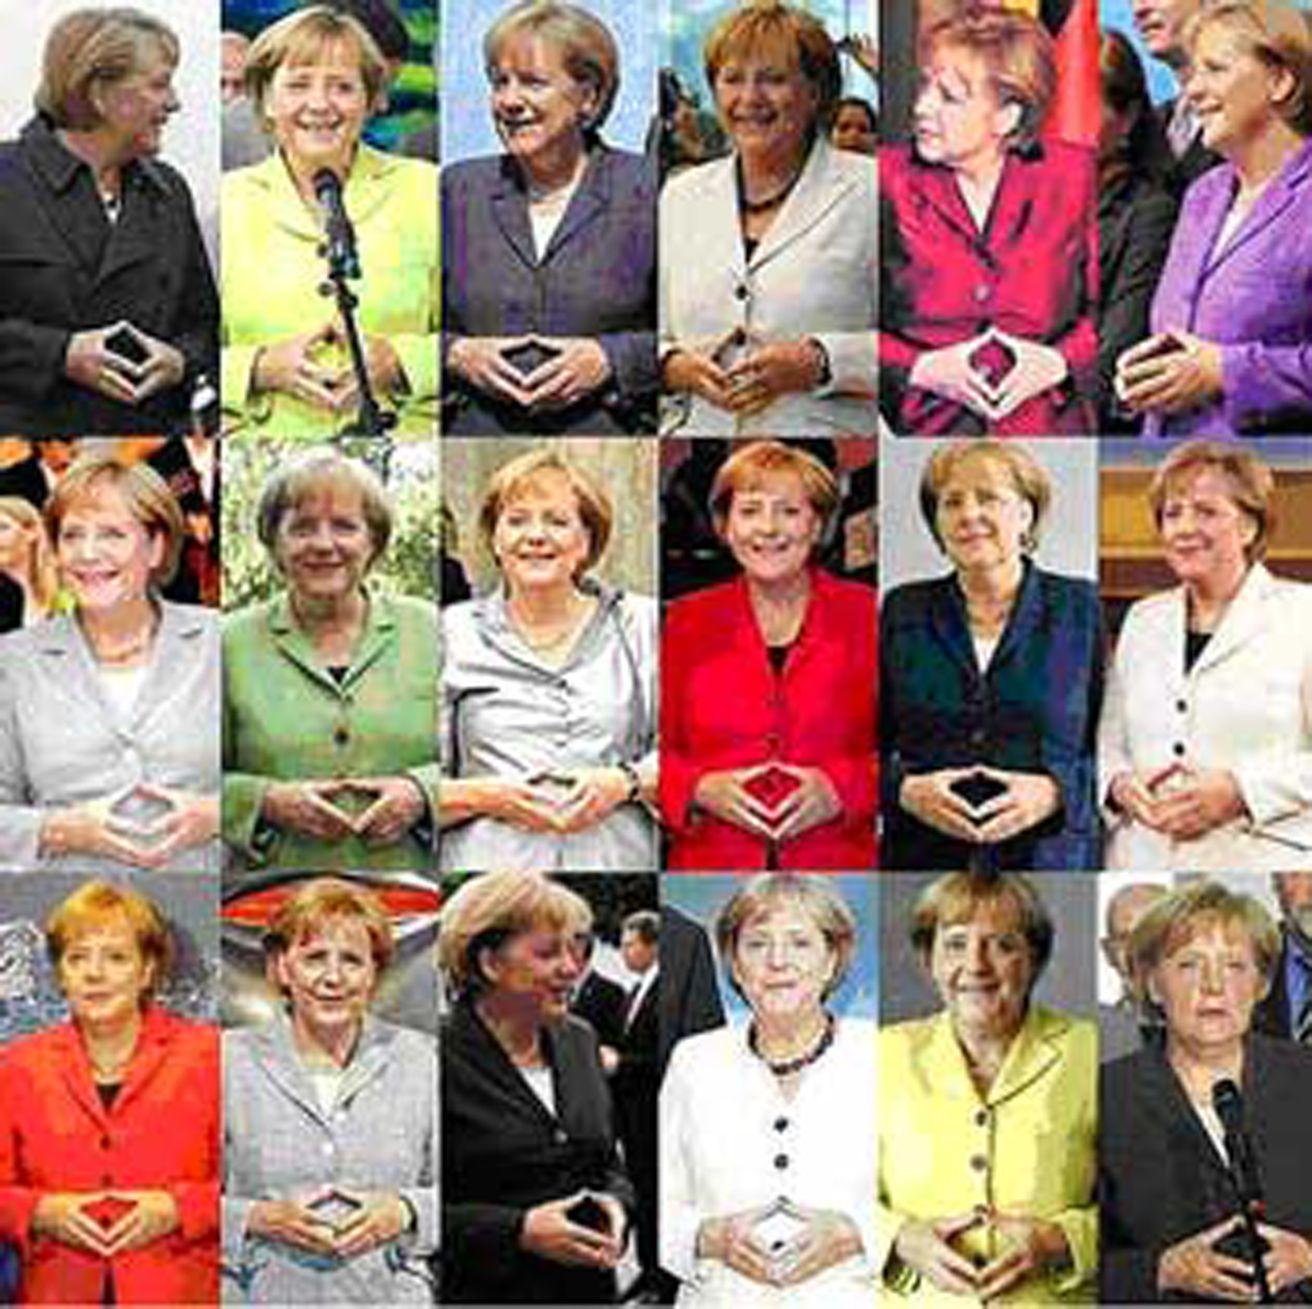 Satanist merkel with illuminati hand sign german prime minister satanist merkel with illuminati hand sign german prime ministerilluminatiangela merkel biocorpaavc Gallery